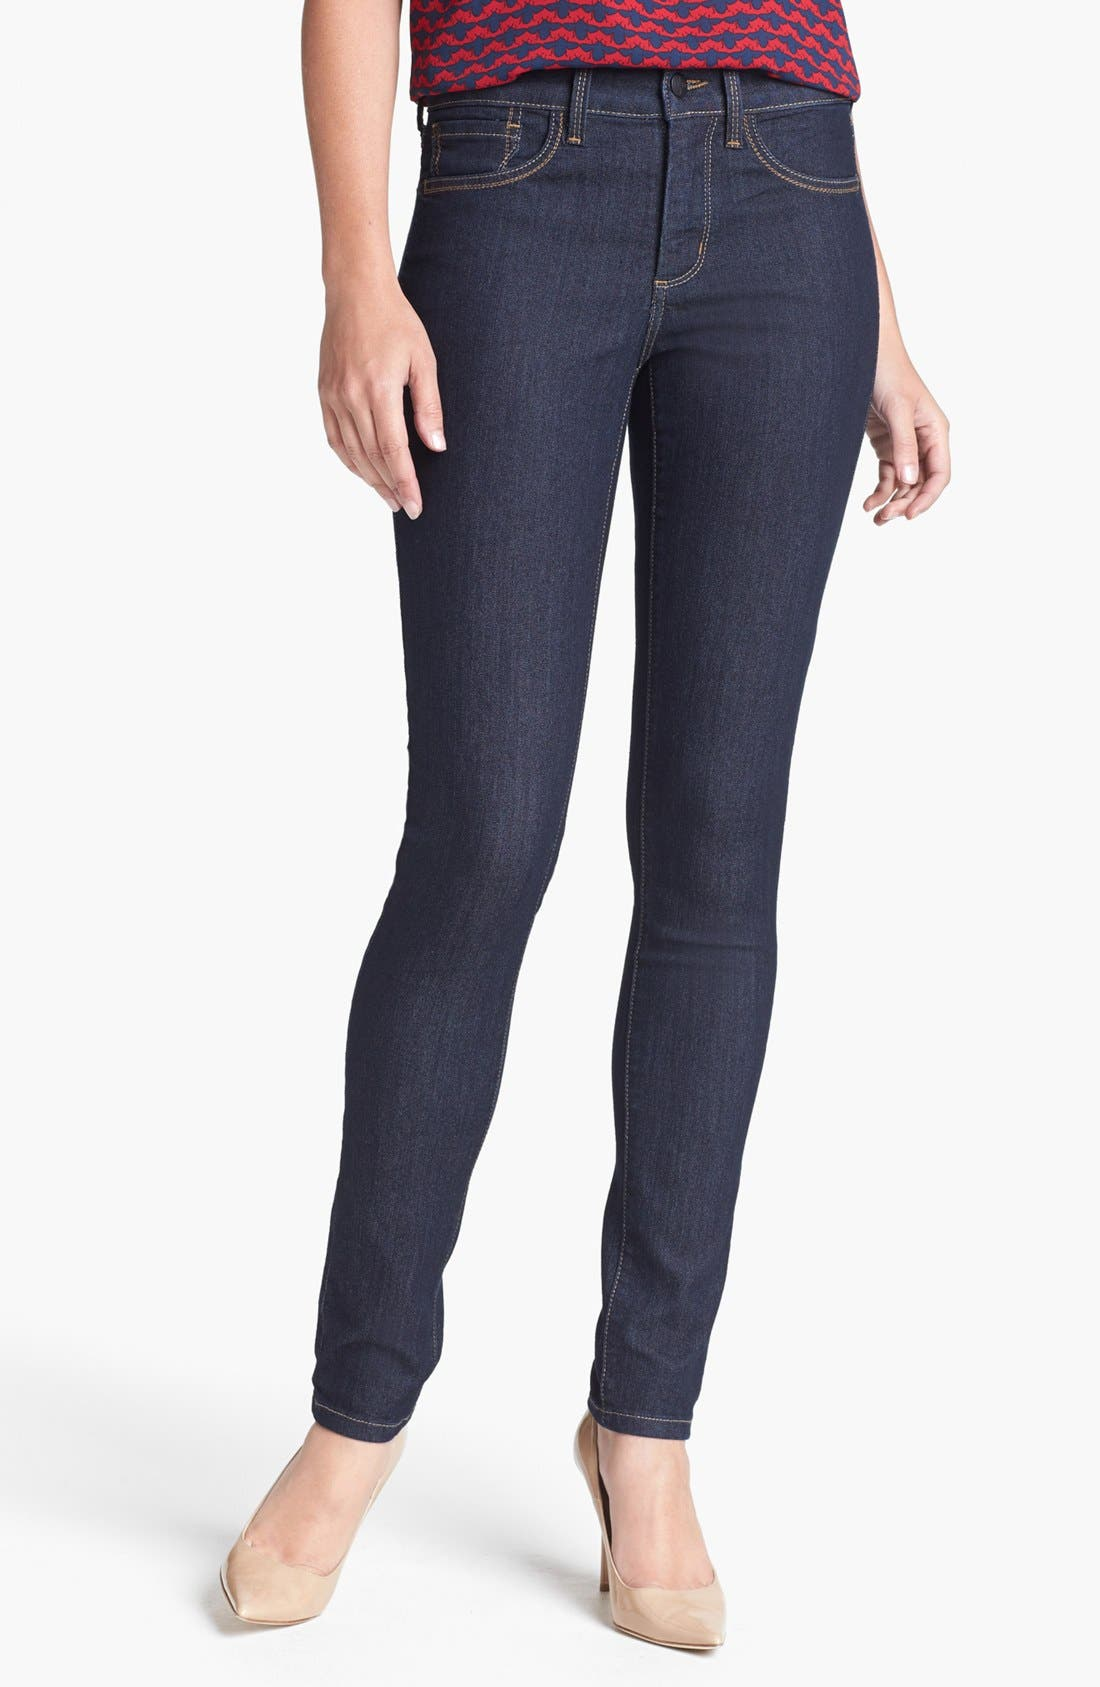 Alternate Image 1 Selected - NYDJ 'Ami' Stretch Skinny Jeans (Dark Enzyme)